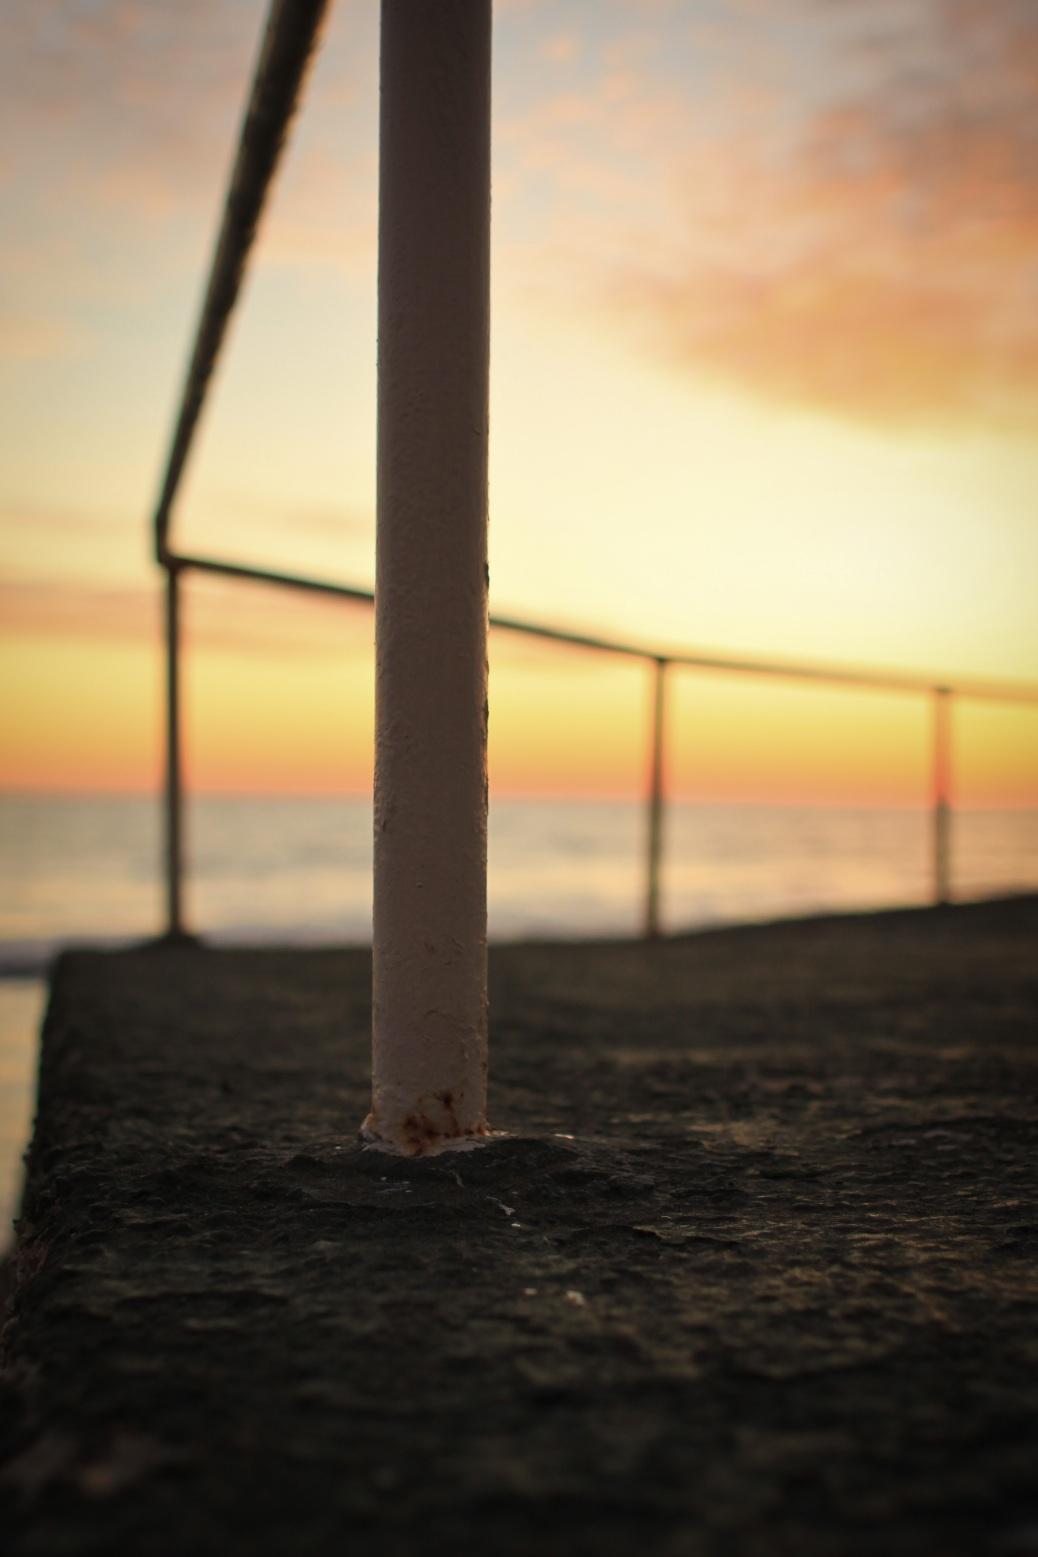 Geländer am Meer Sonnenuntergang